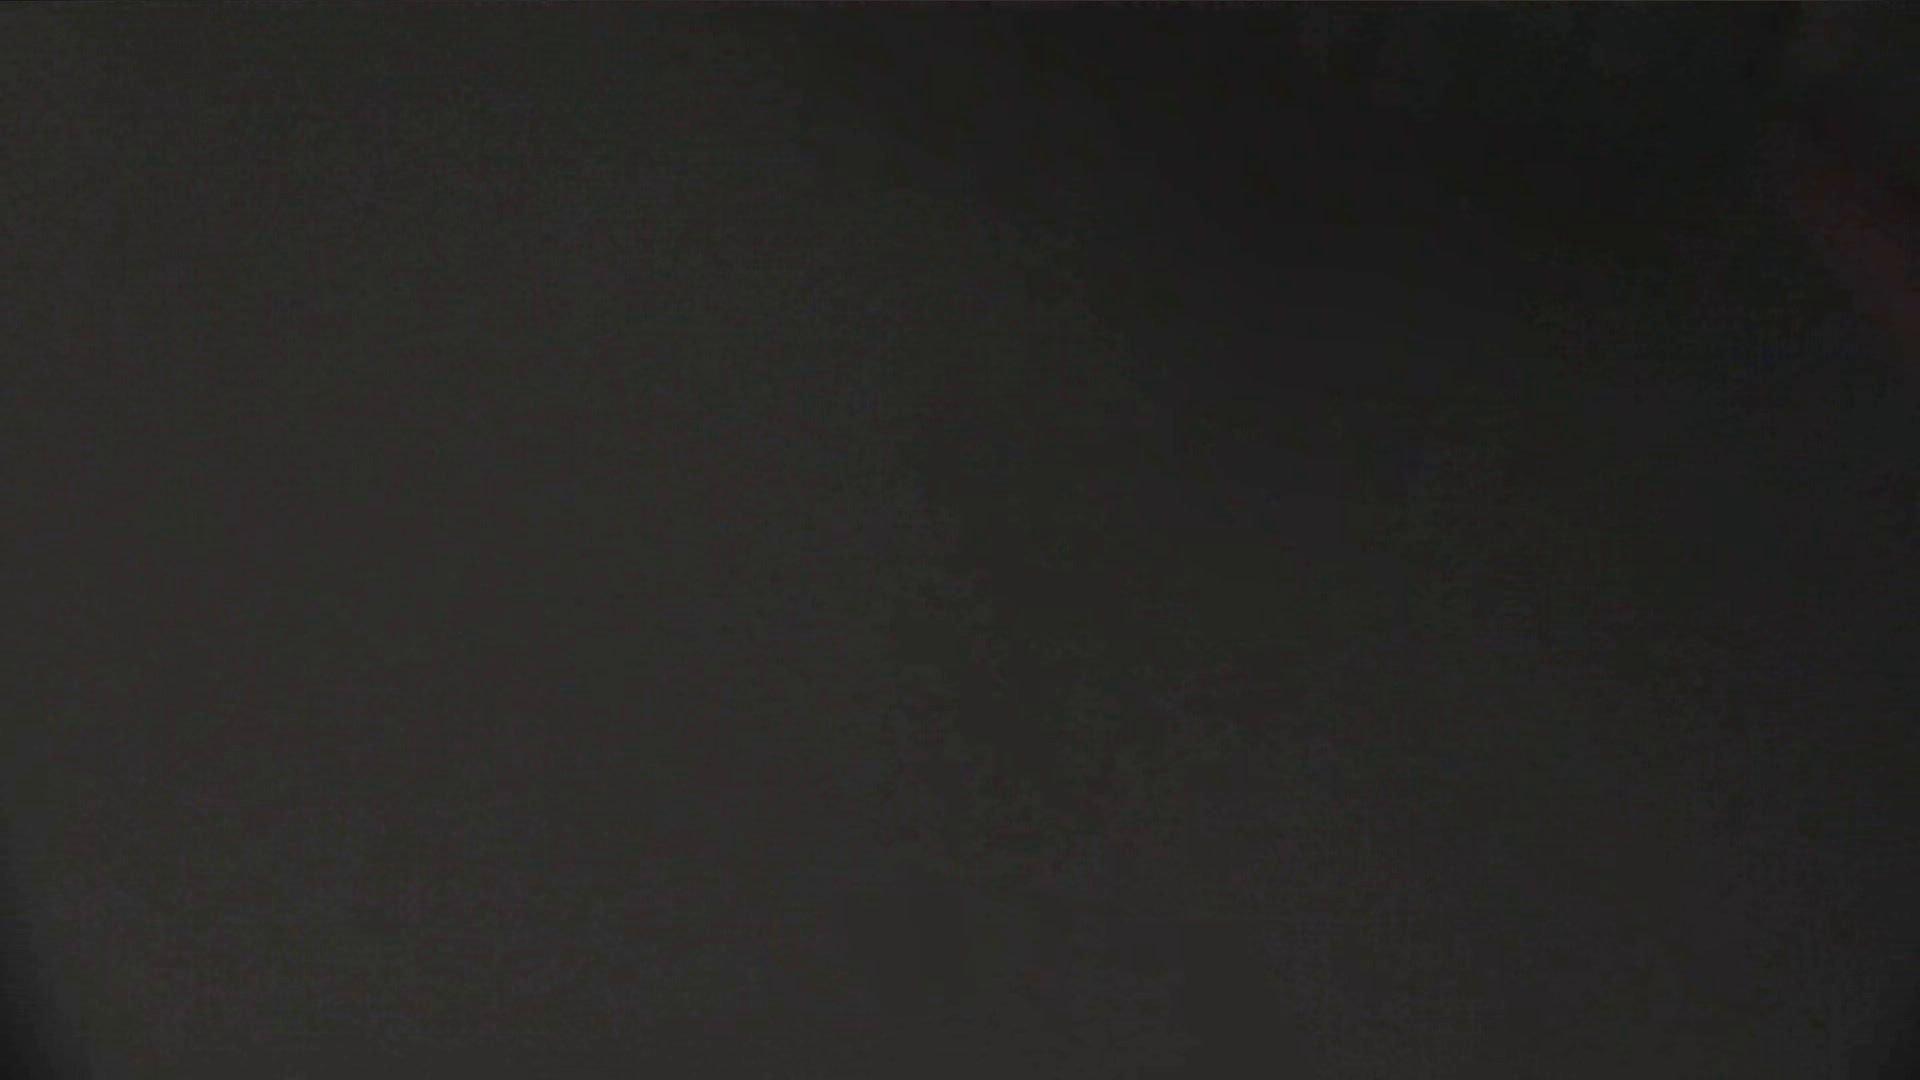 vol.07 命がけ潜伏洗面所! 結構寄れたとおもいます。(笑) プライベート オマンコ無修正動画無料 104pic 59